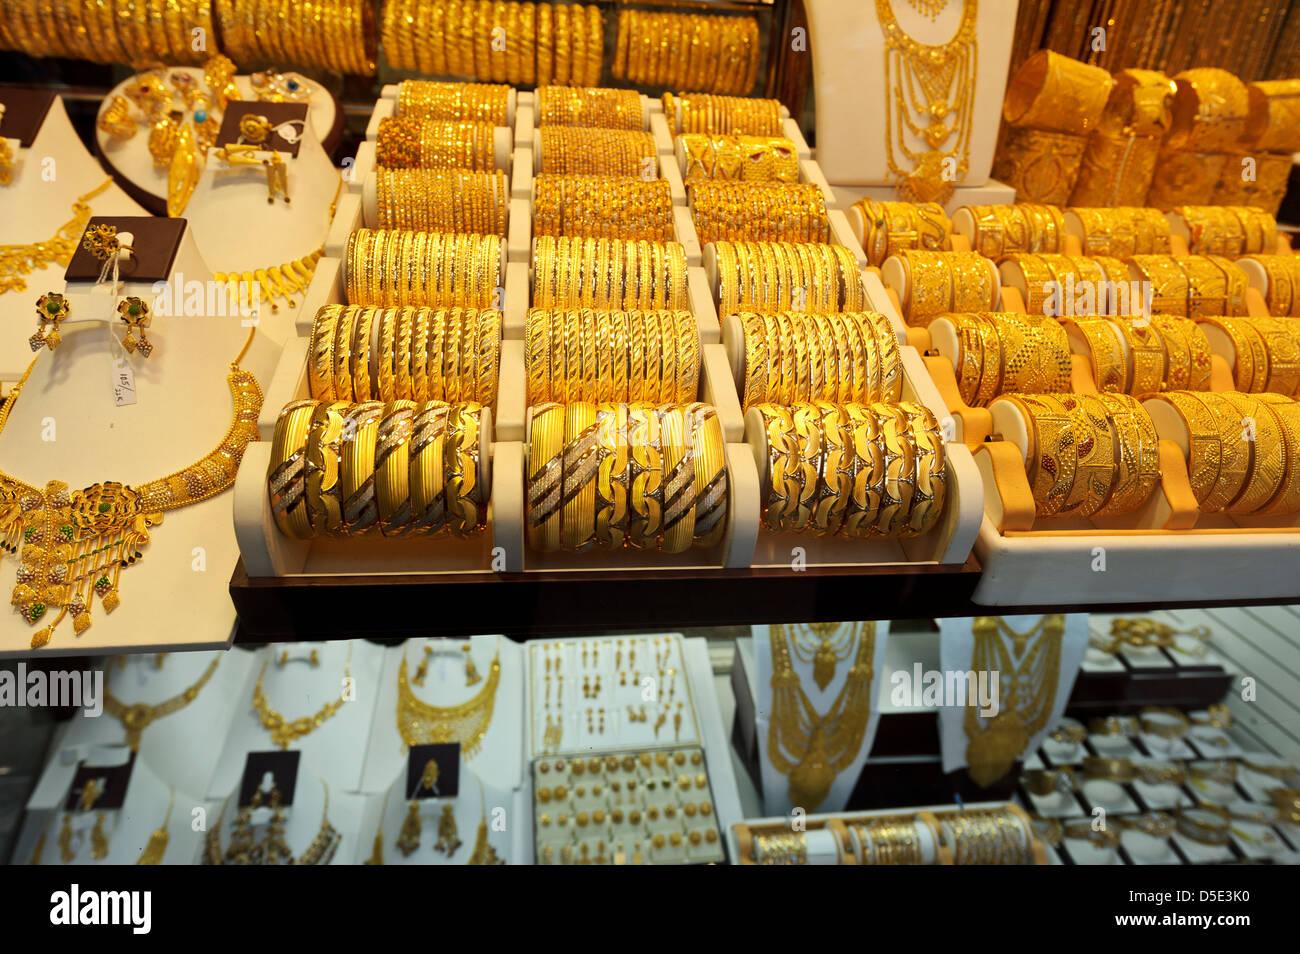 Gold Jewellery on sale, Dubai Gold Souk, Dubai, United Arab Emirates. - Stock Image